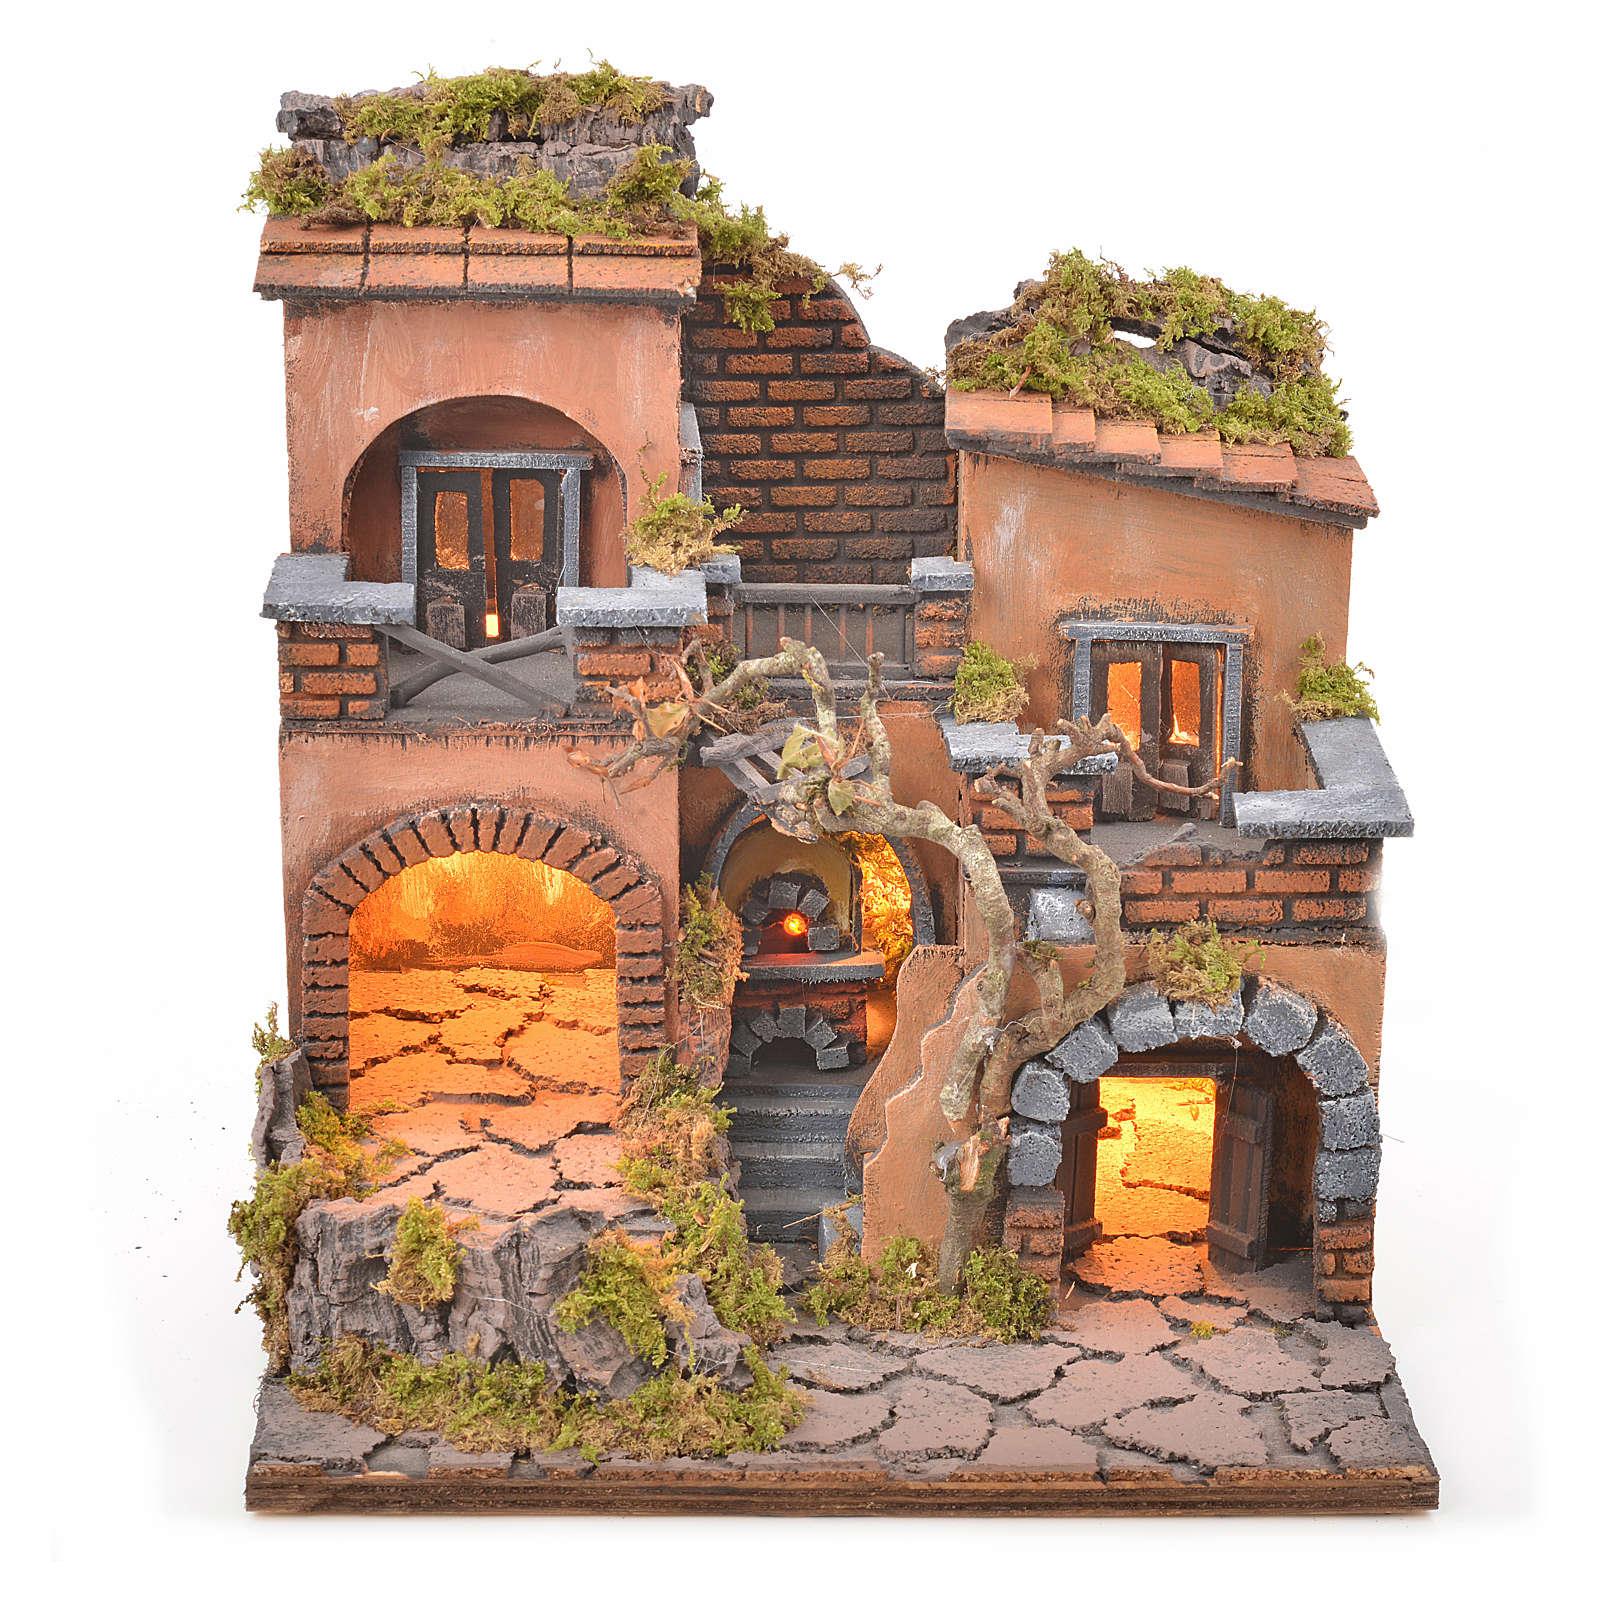 Borgo presepe napoletano con forno e luce 33x32x27 4